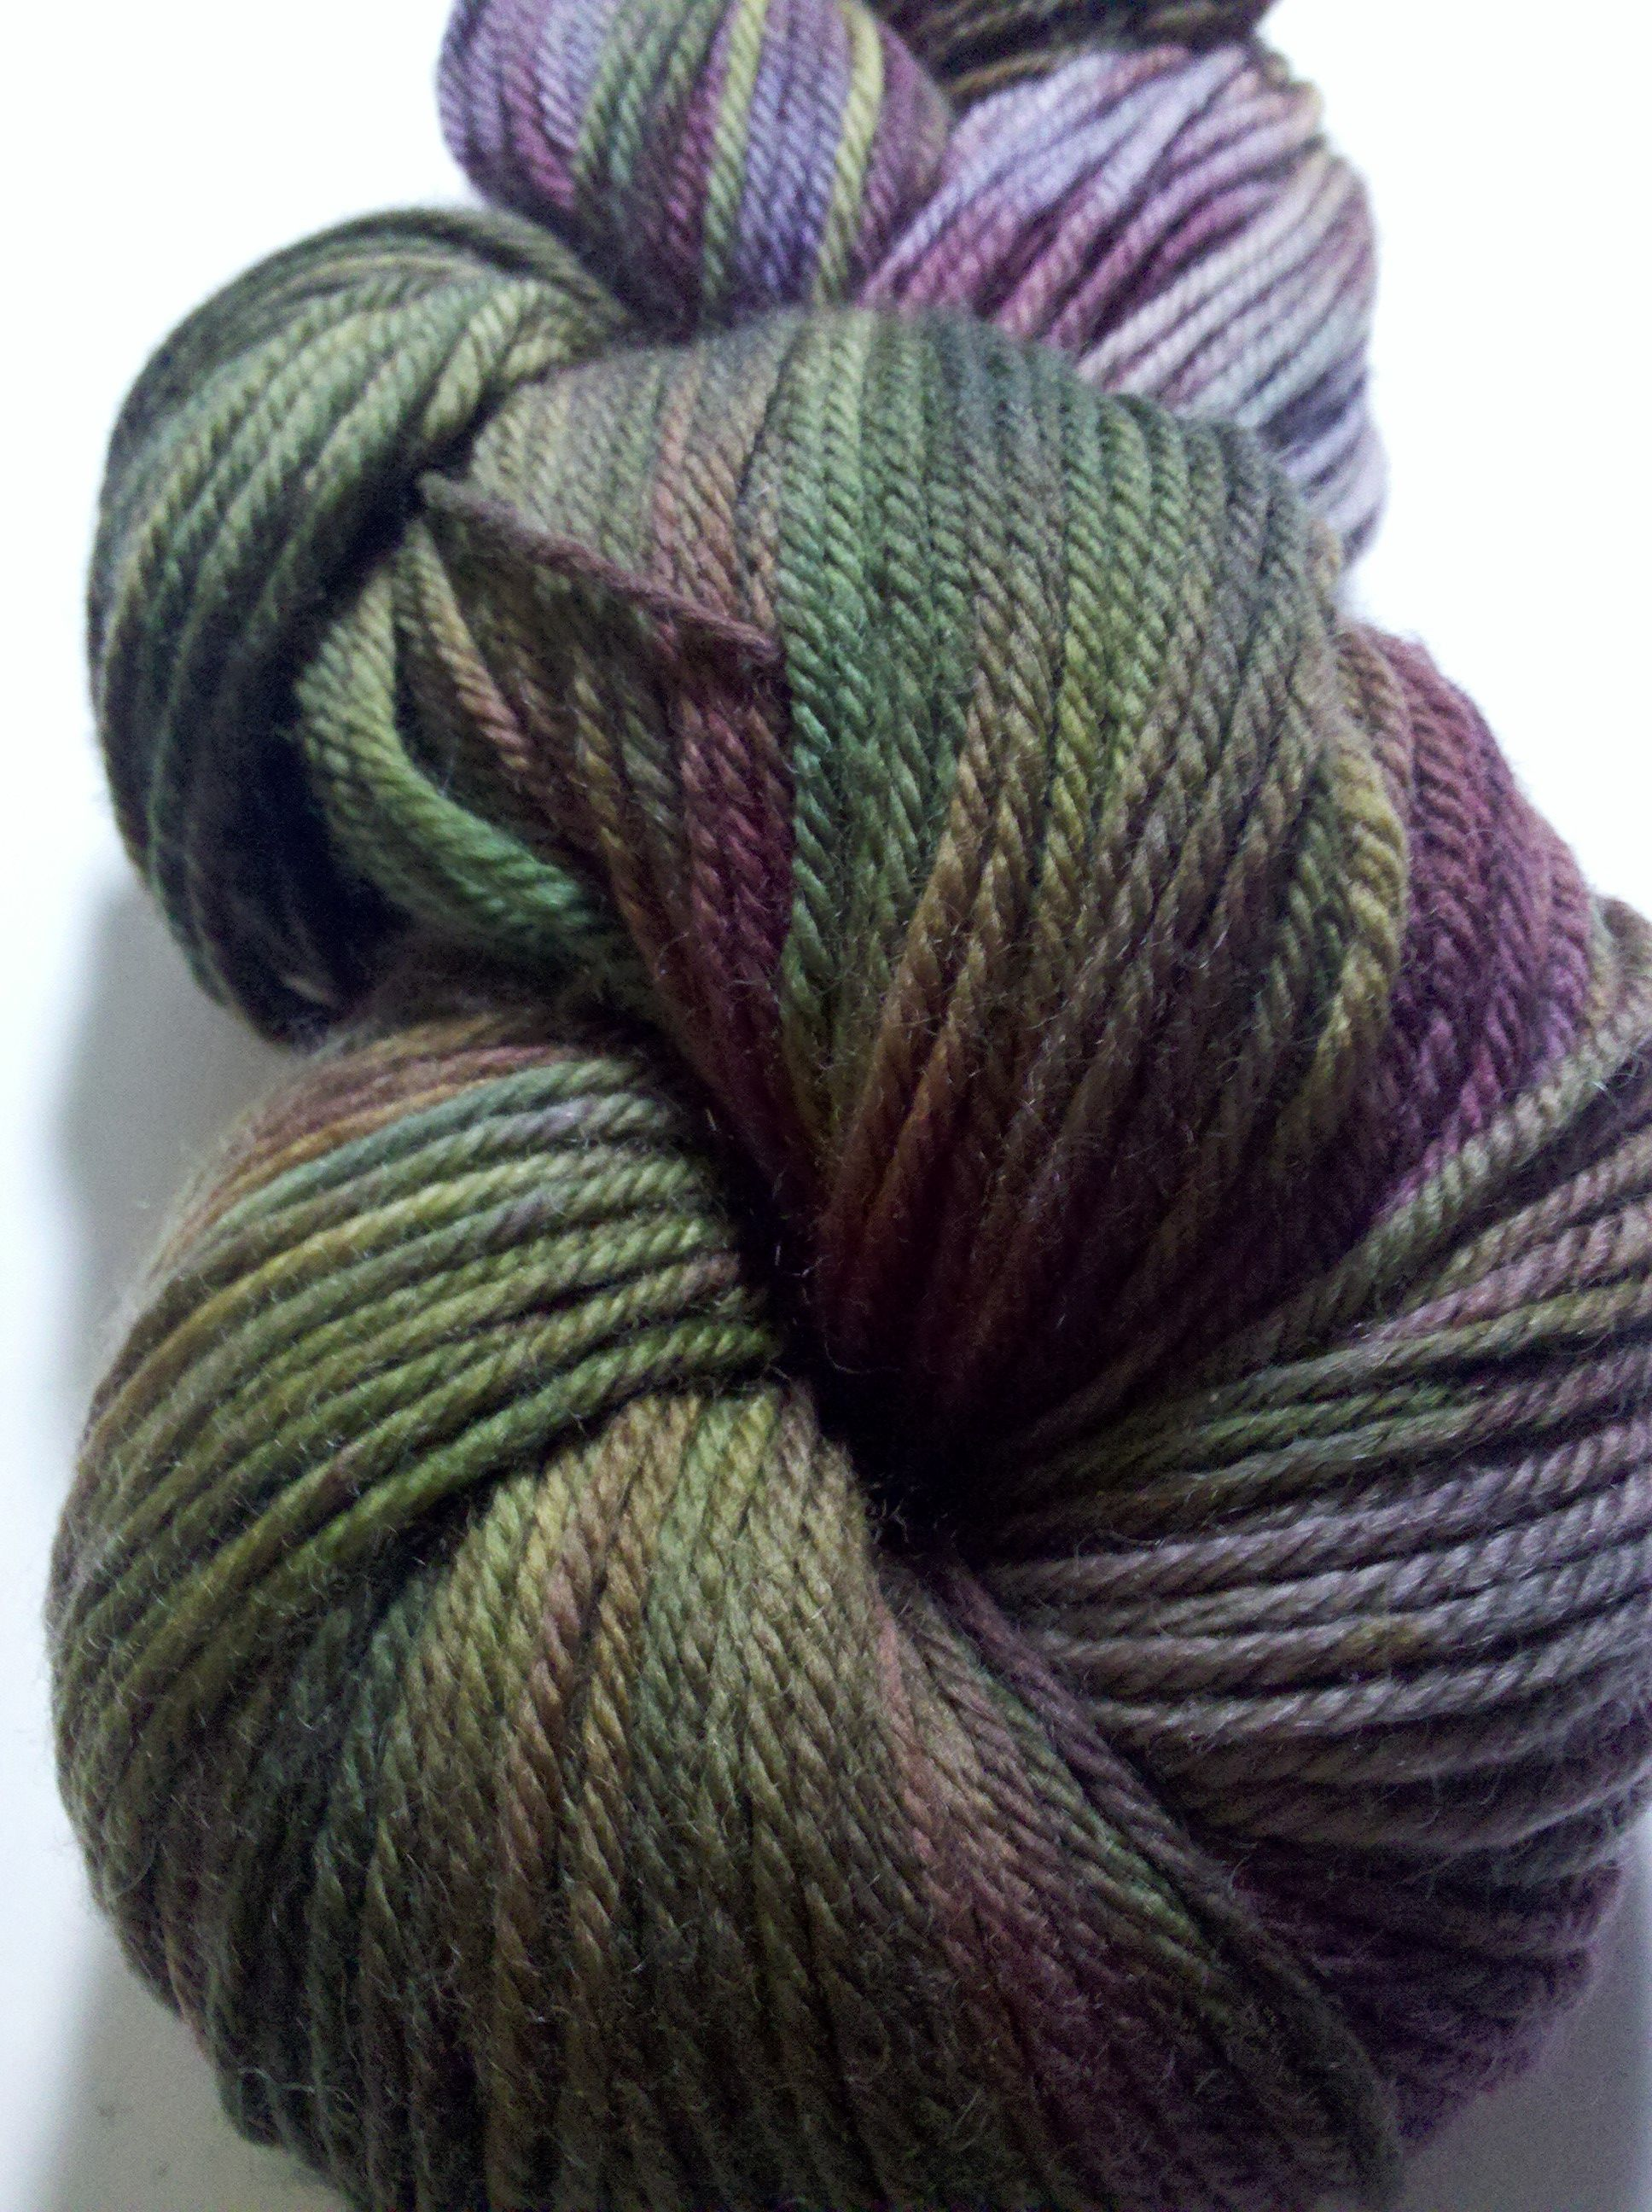 Goblin Queen in Socket sock yarn, 100% superwash merino